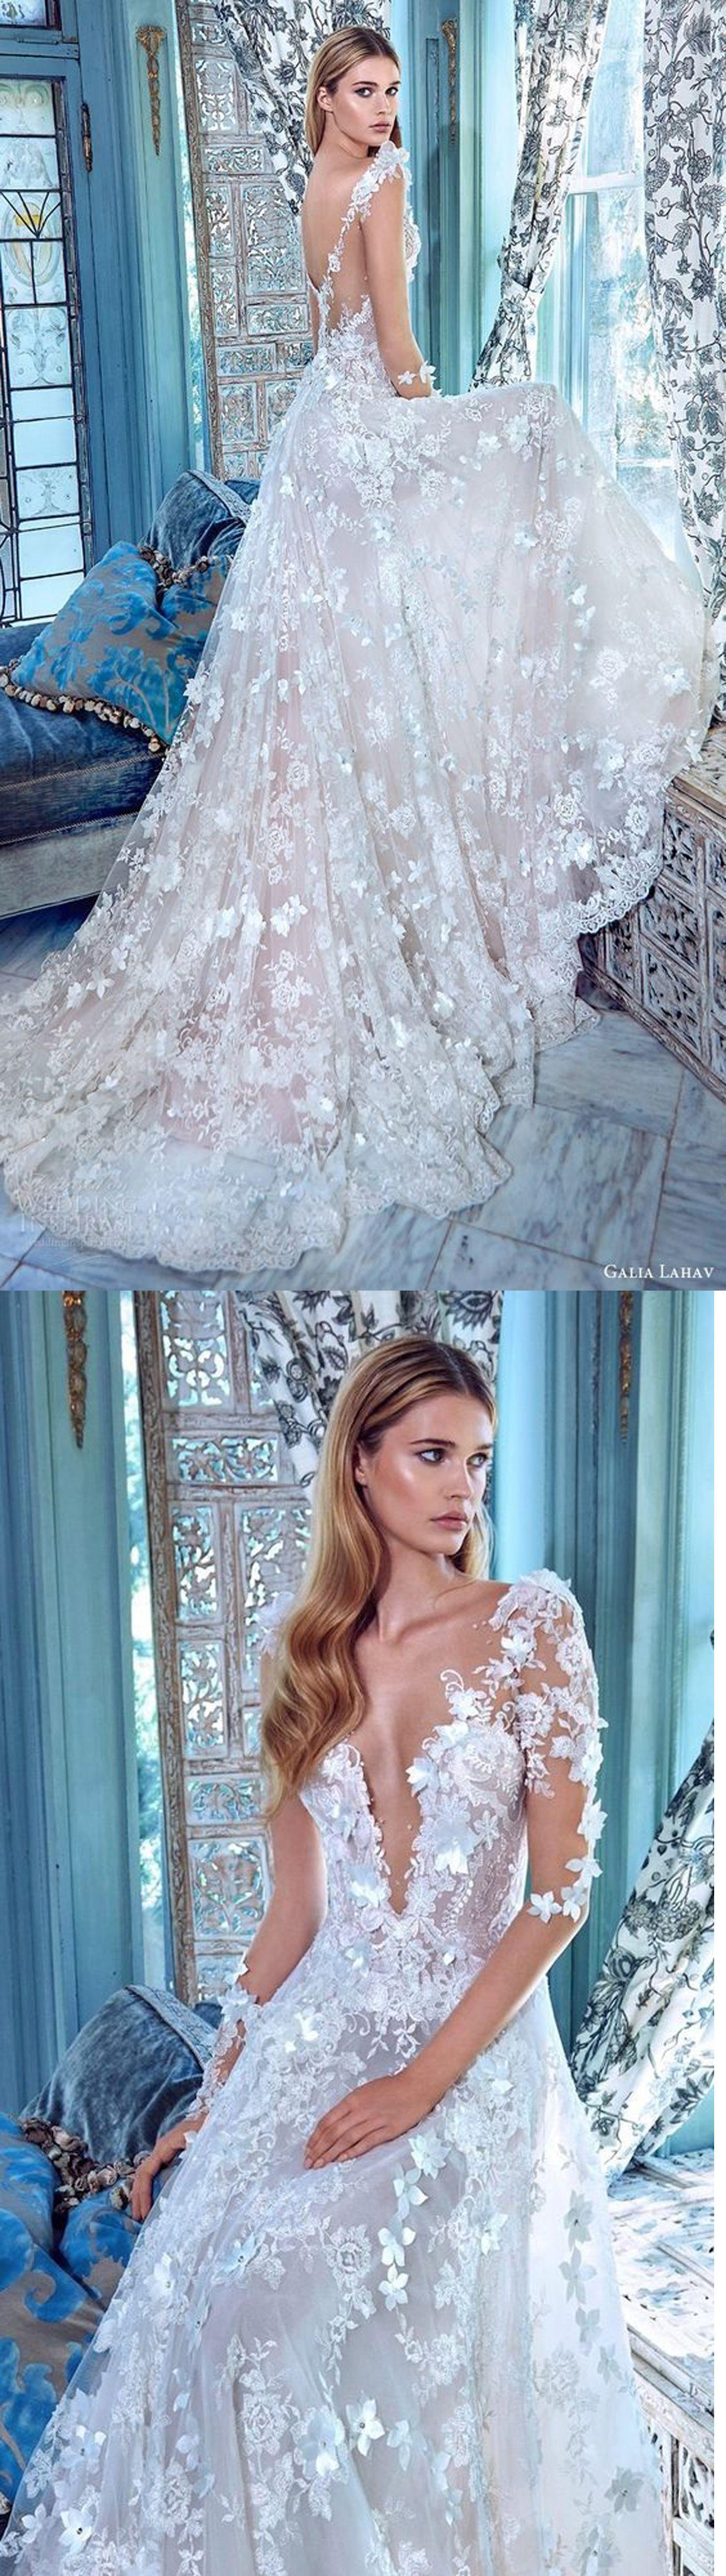 V-Neck Wedding Dress,Lace Wedding Gowns,Appliques Evening Dresses ...